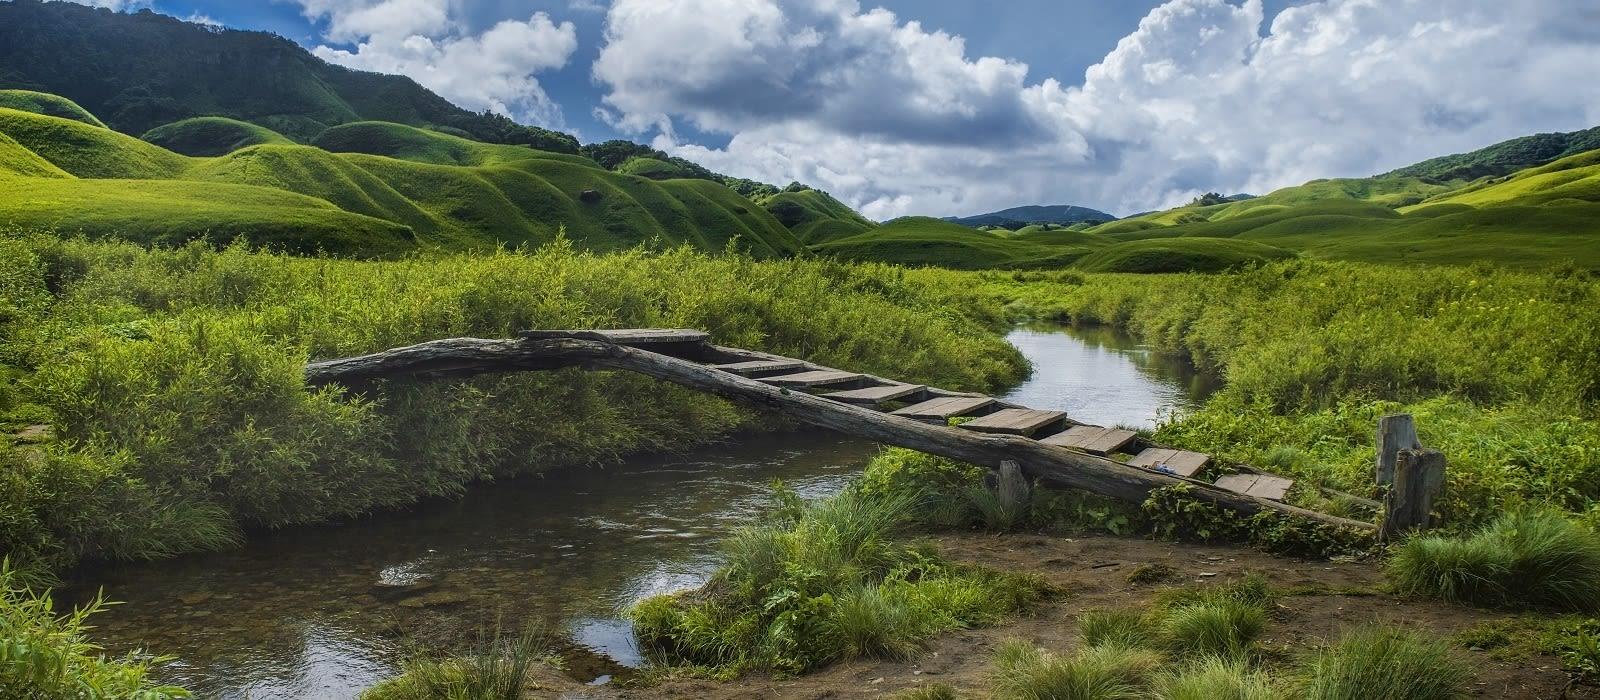 Eastern Gems, Landscapes and Culture Tour Trip 8